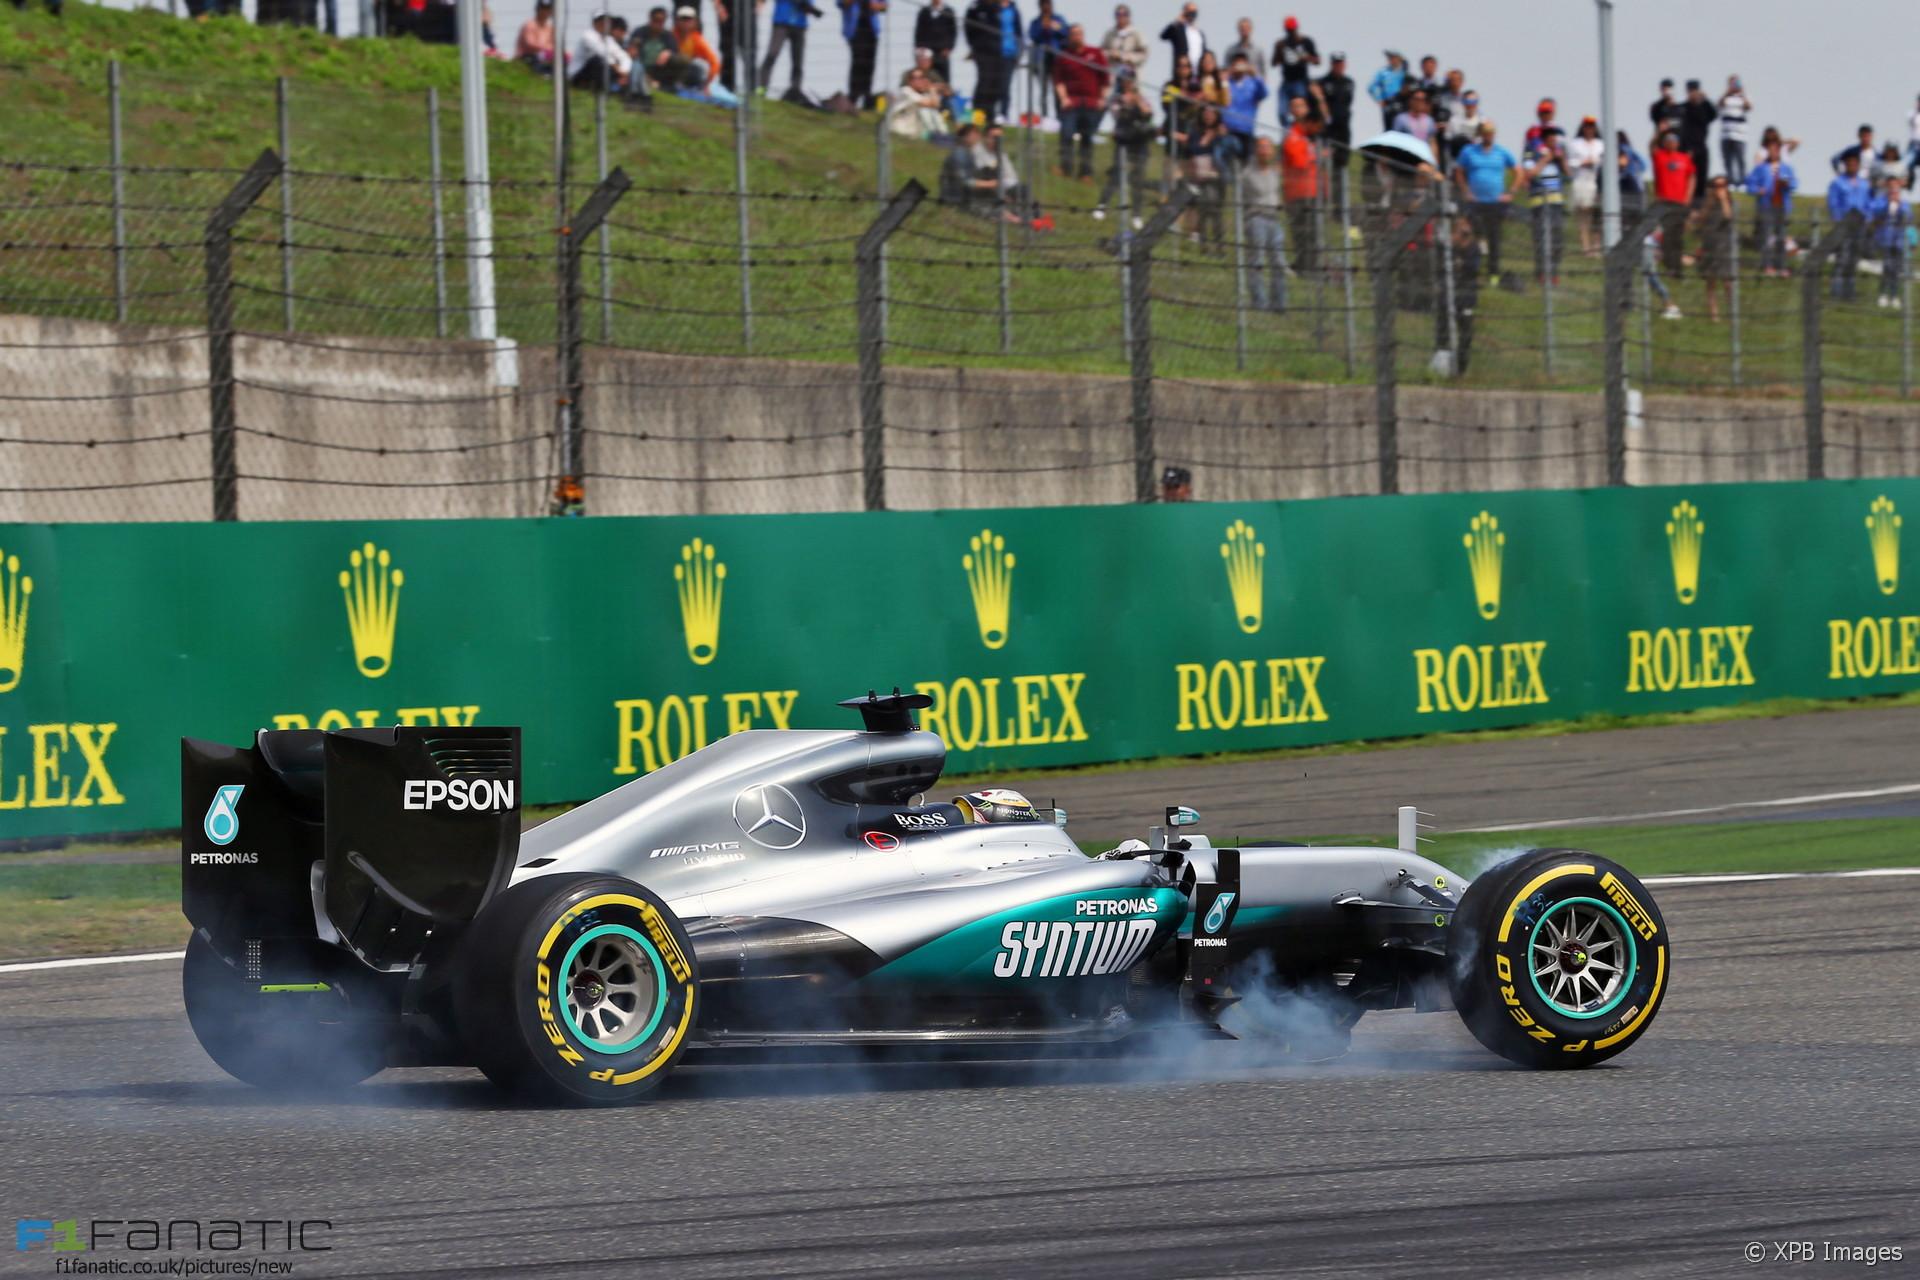 Lewis Hamilton, Mercedes, Shanghai International Circuit, 2016